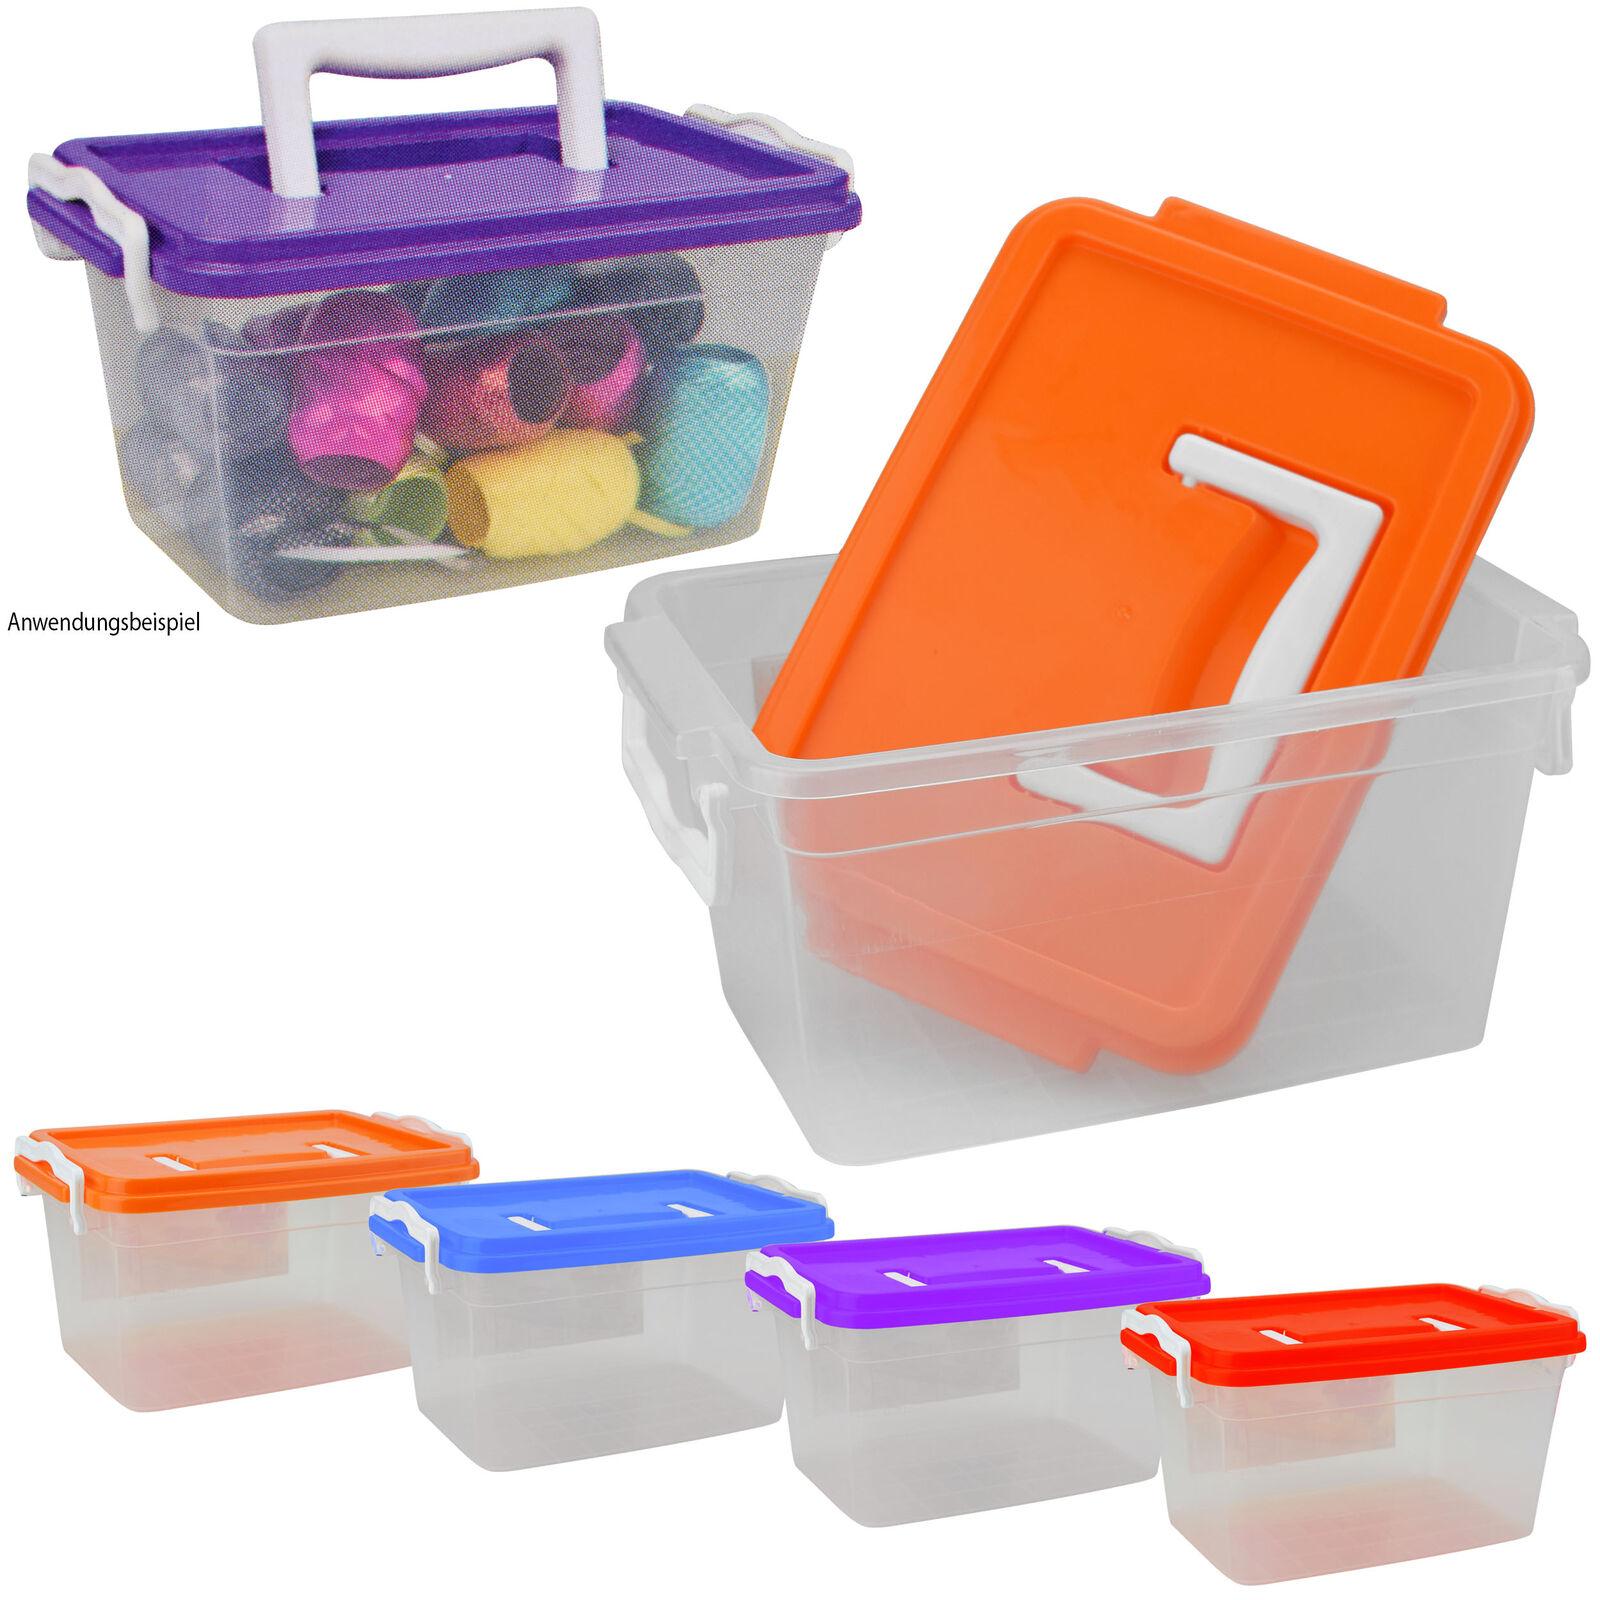 Stemo Lagerbox 50x9x11cm Box Kiste Stapelkiste Sortierkiste Sortierbox blau